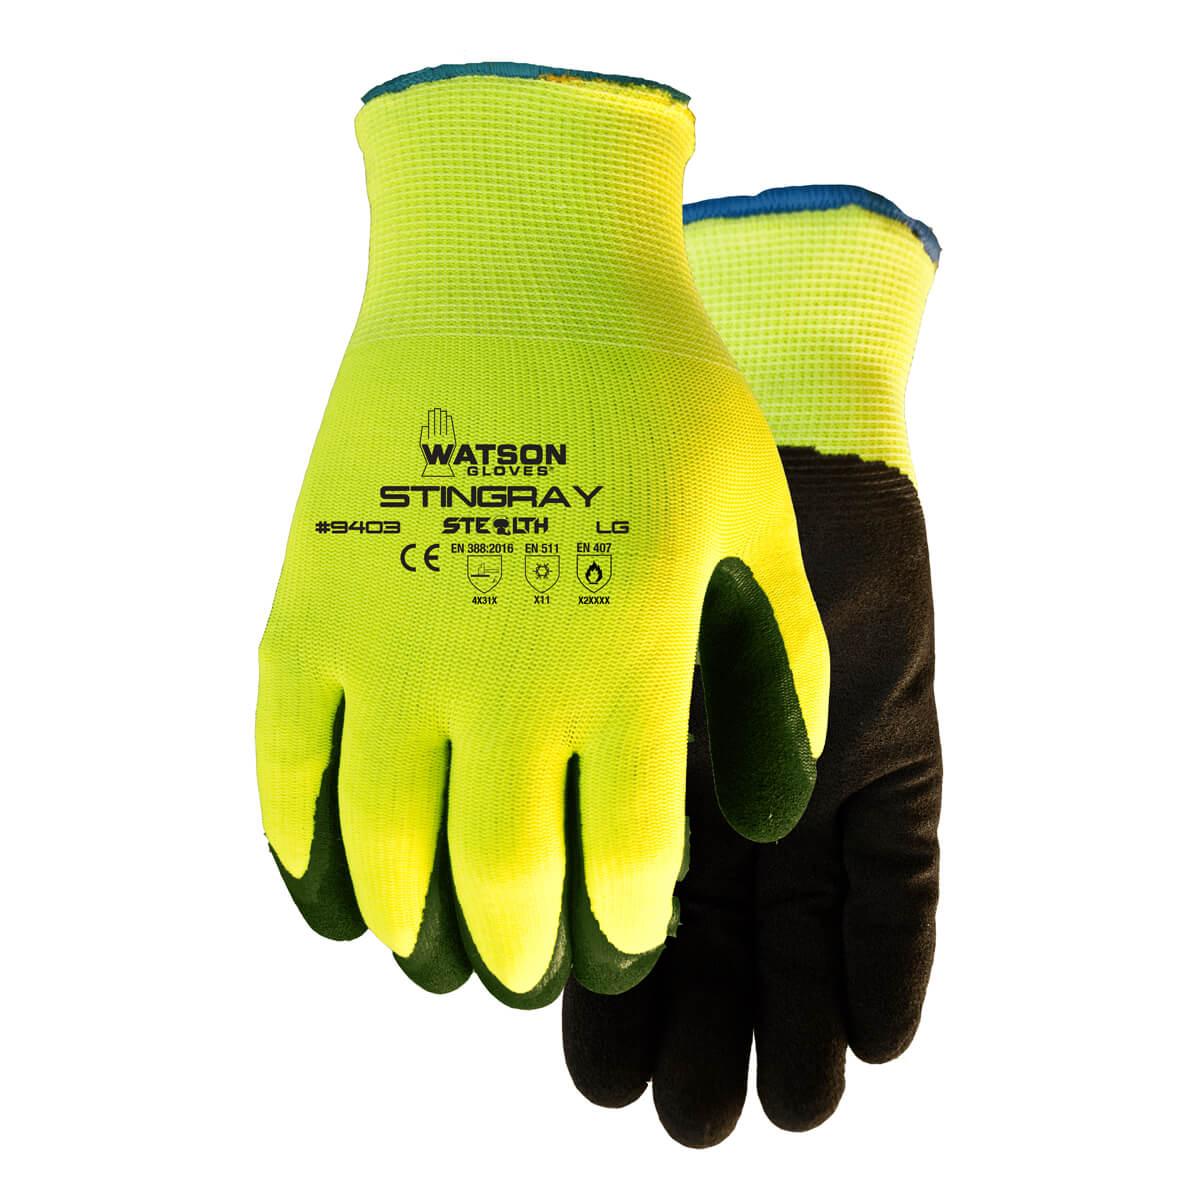 Stealth Stingray Gloves - XL